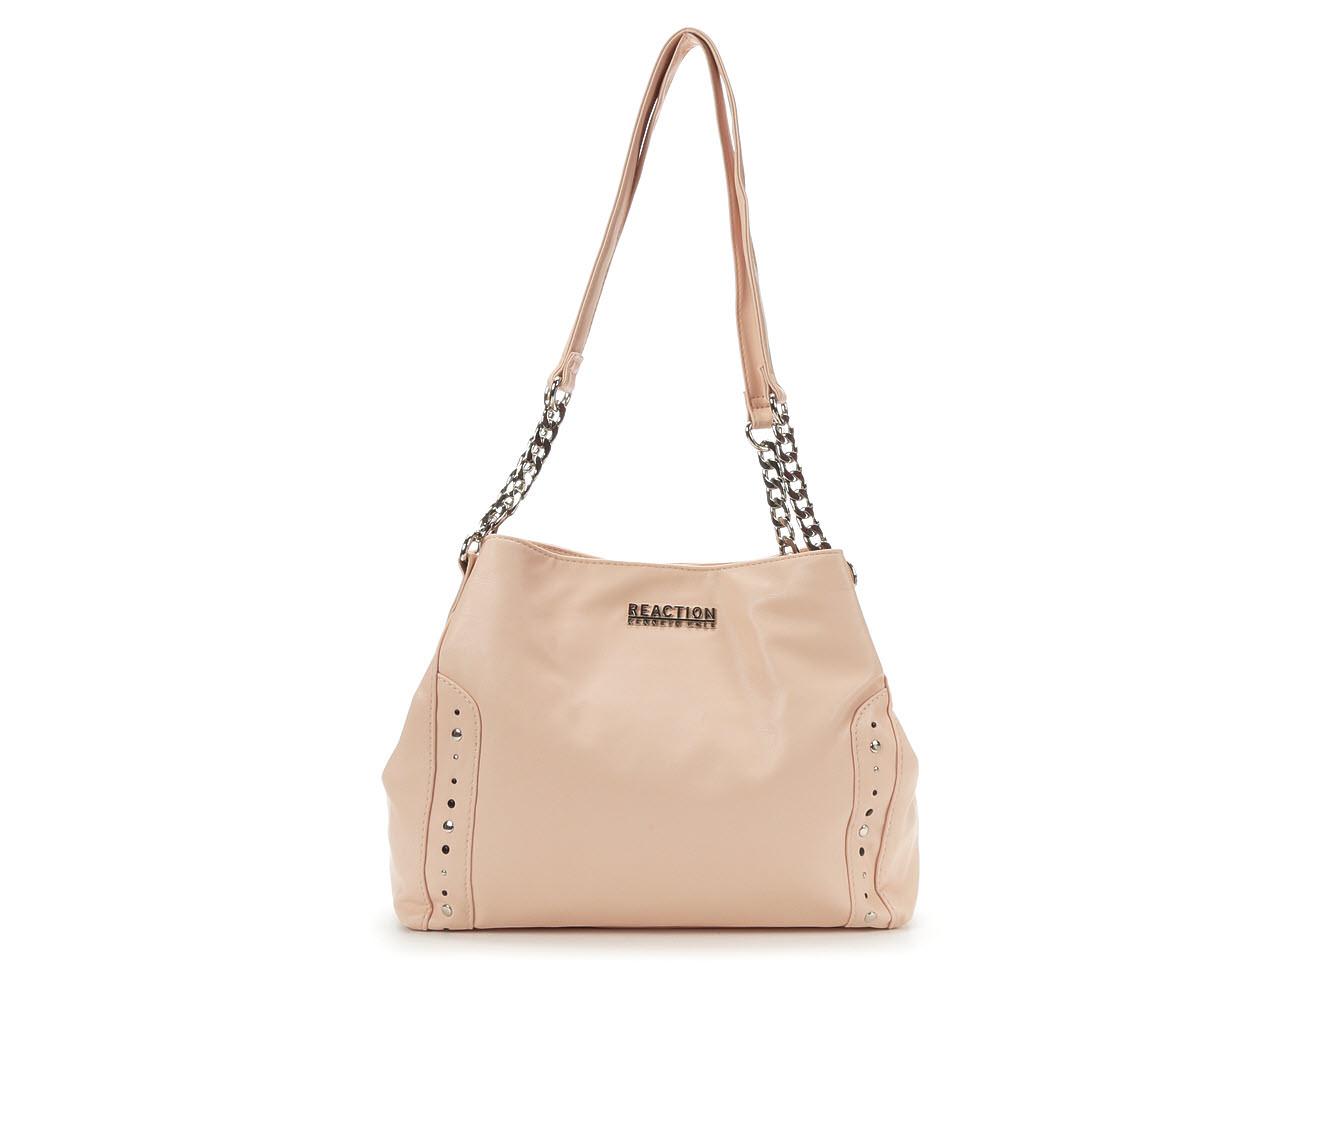 Kenneth Cole Reaction Berry Satchel Handbag (Pink)